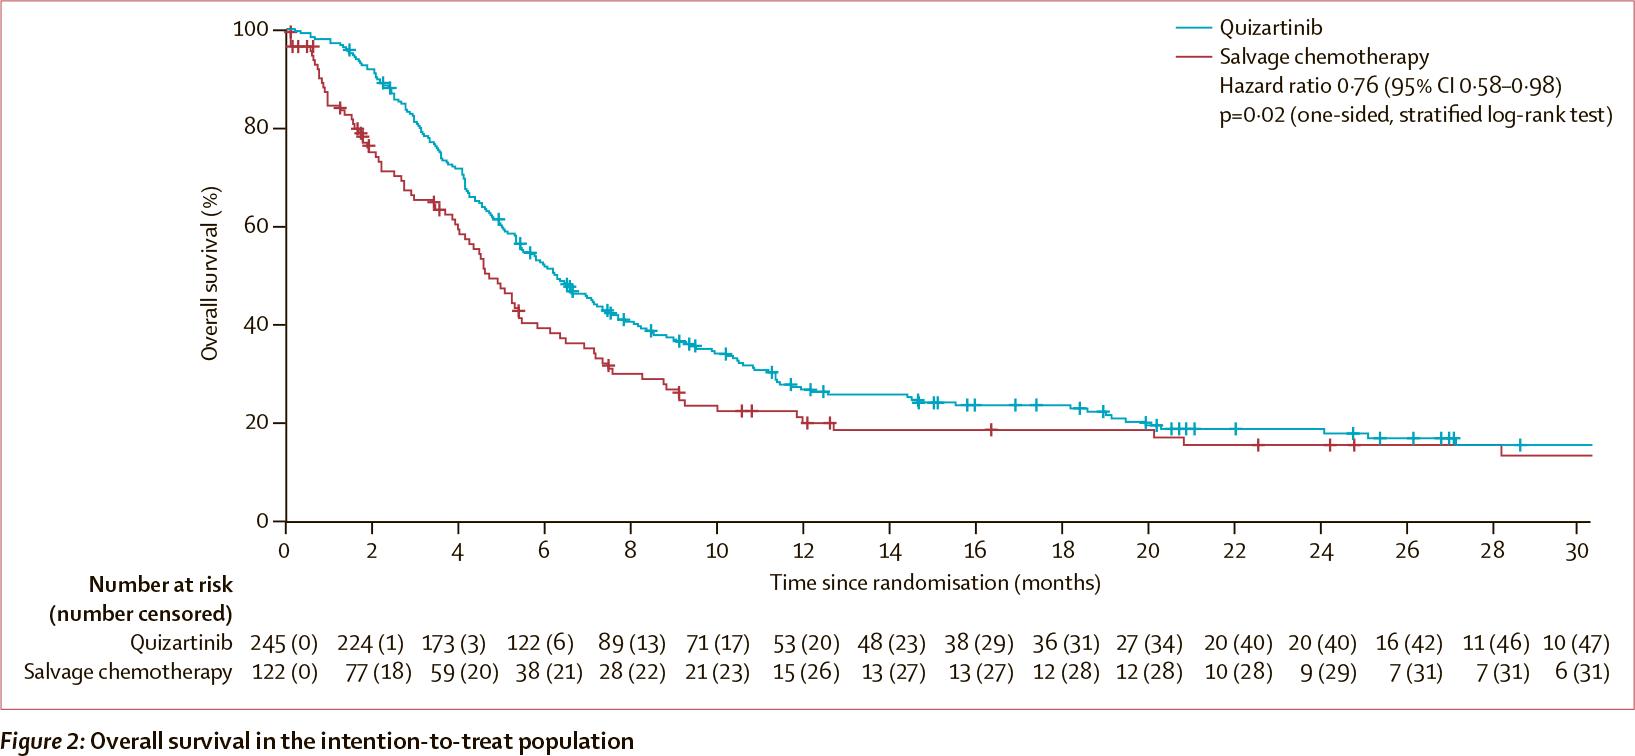 quizartinib clinical results 01 - «Ванфлайта»: новое лекарство против острого миелоидного лейкоза